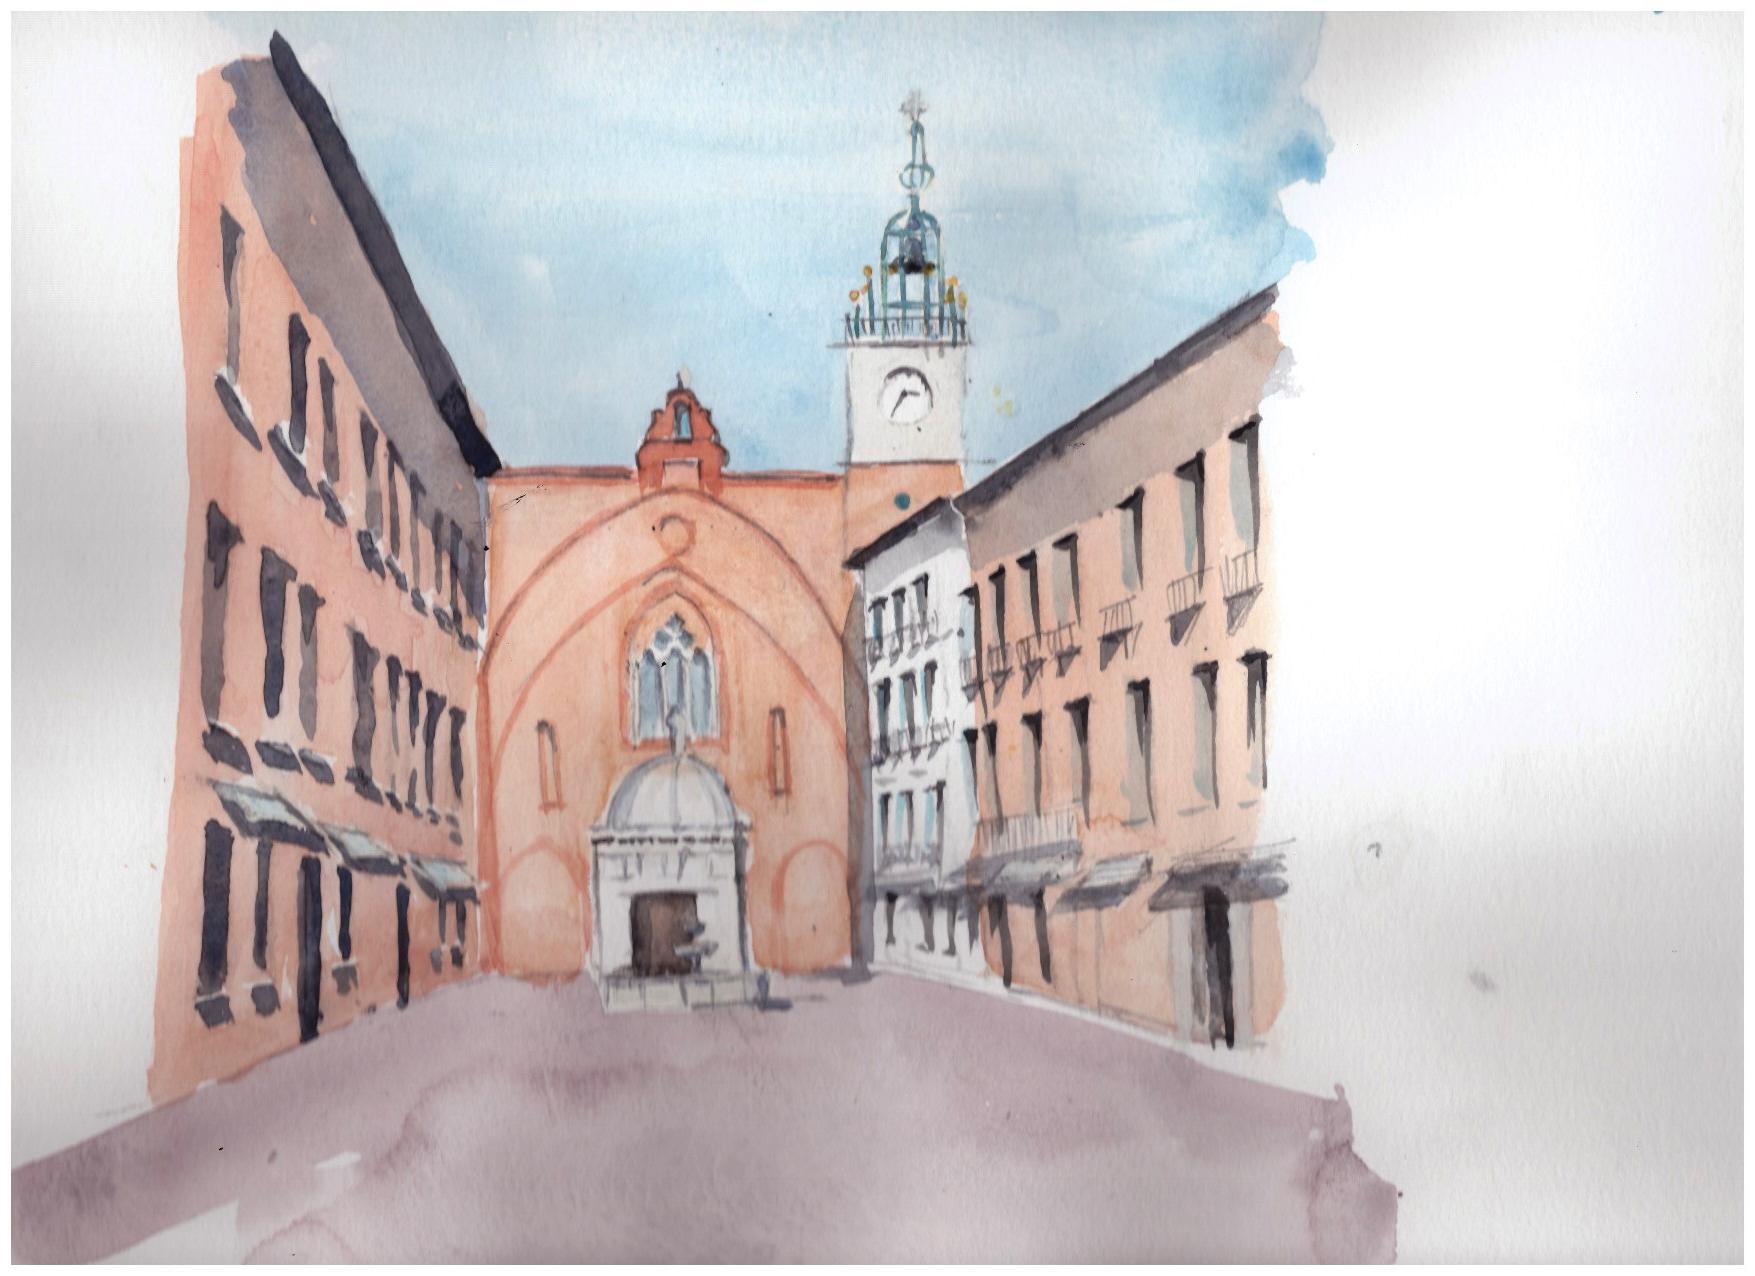 La cathédrale St Jean Baptiste Juin-2016